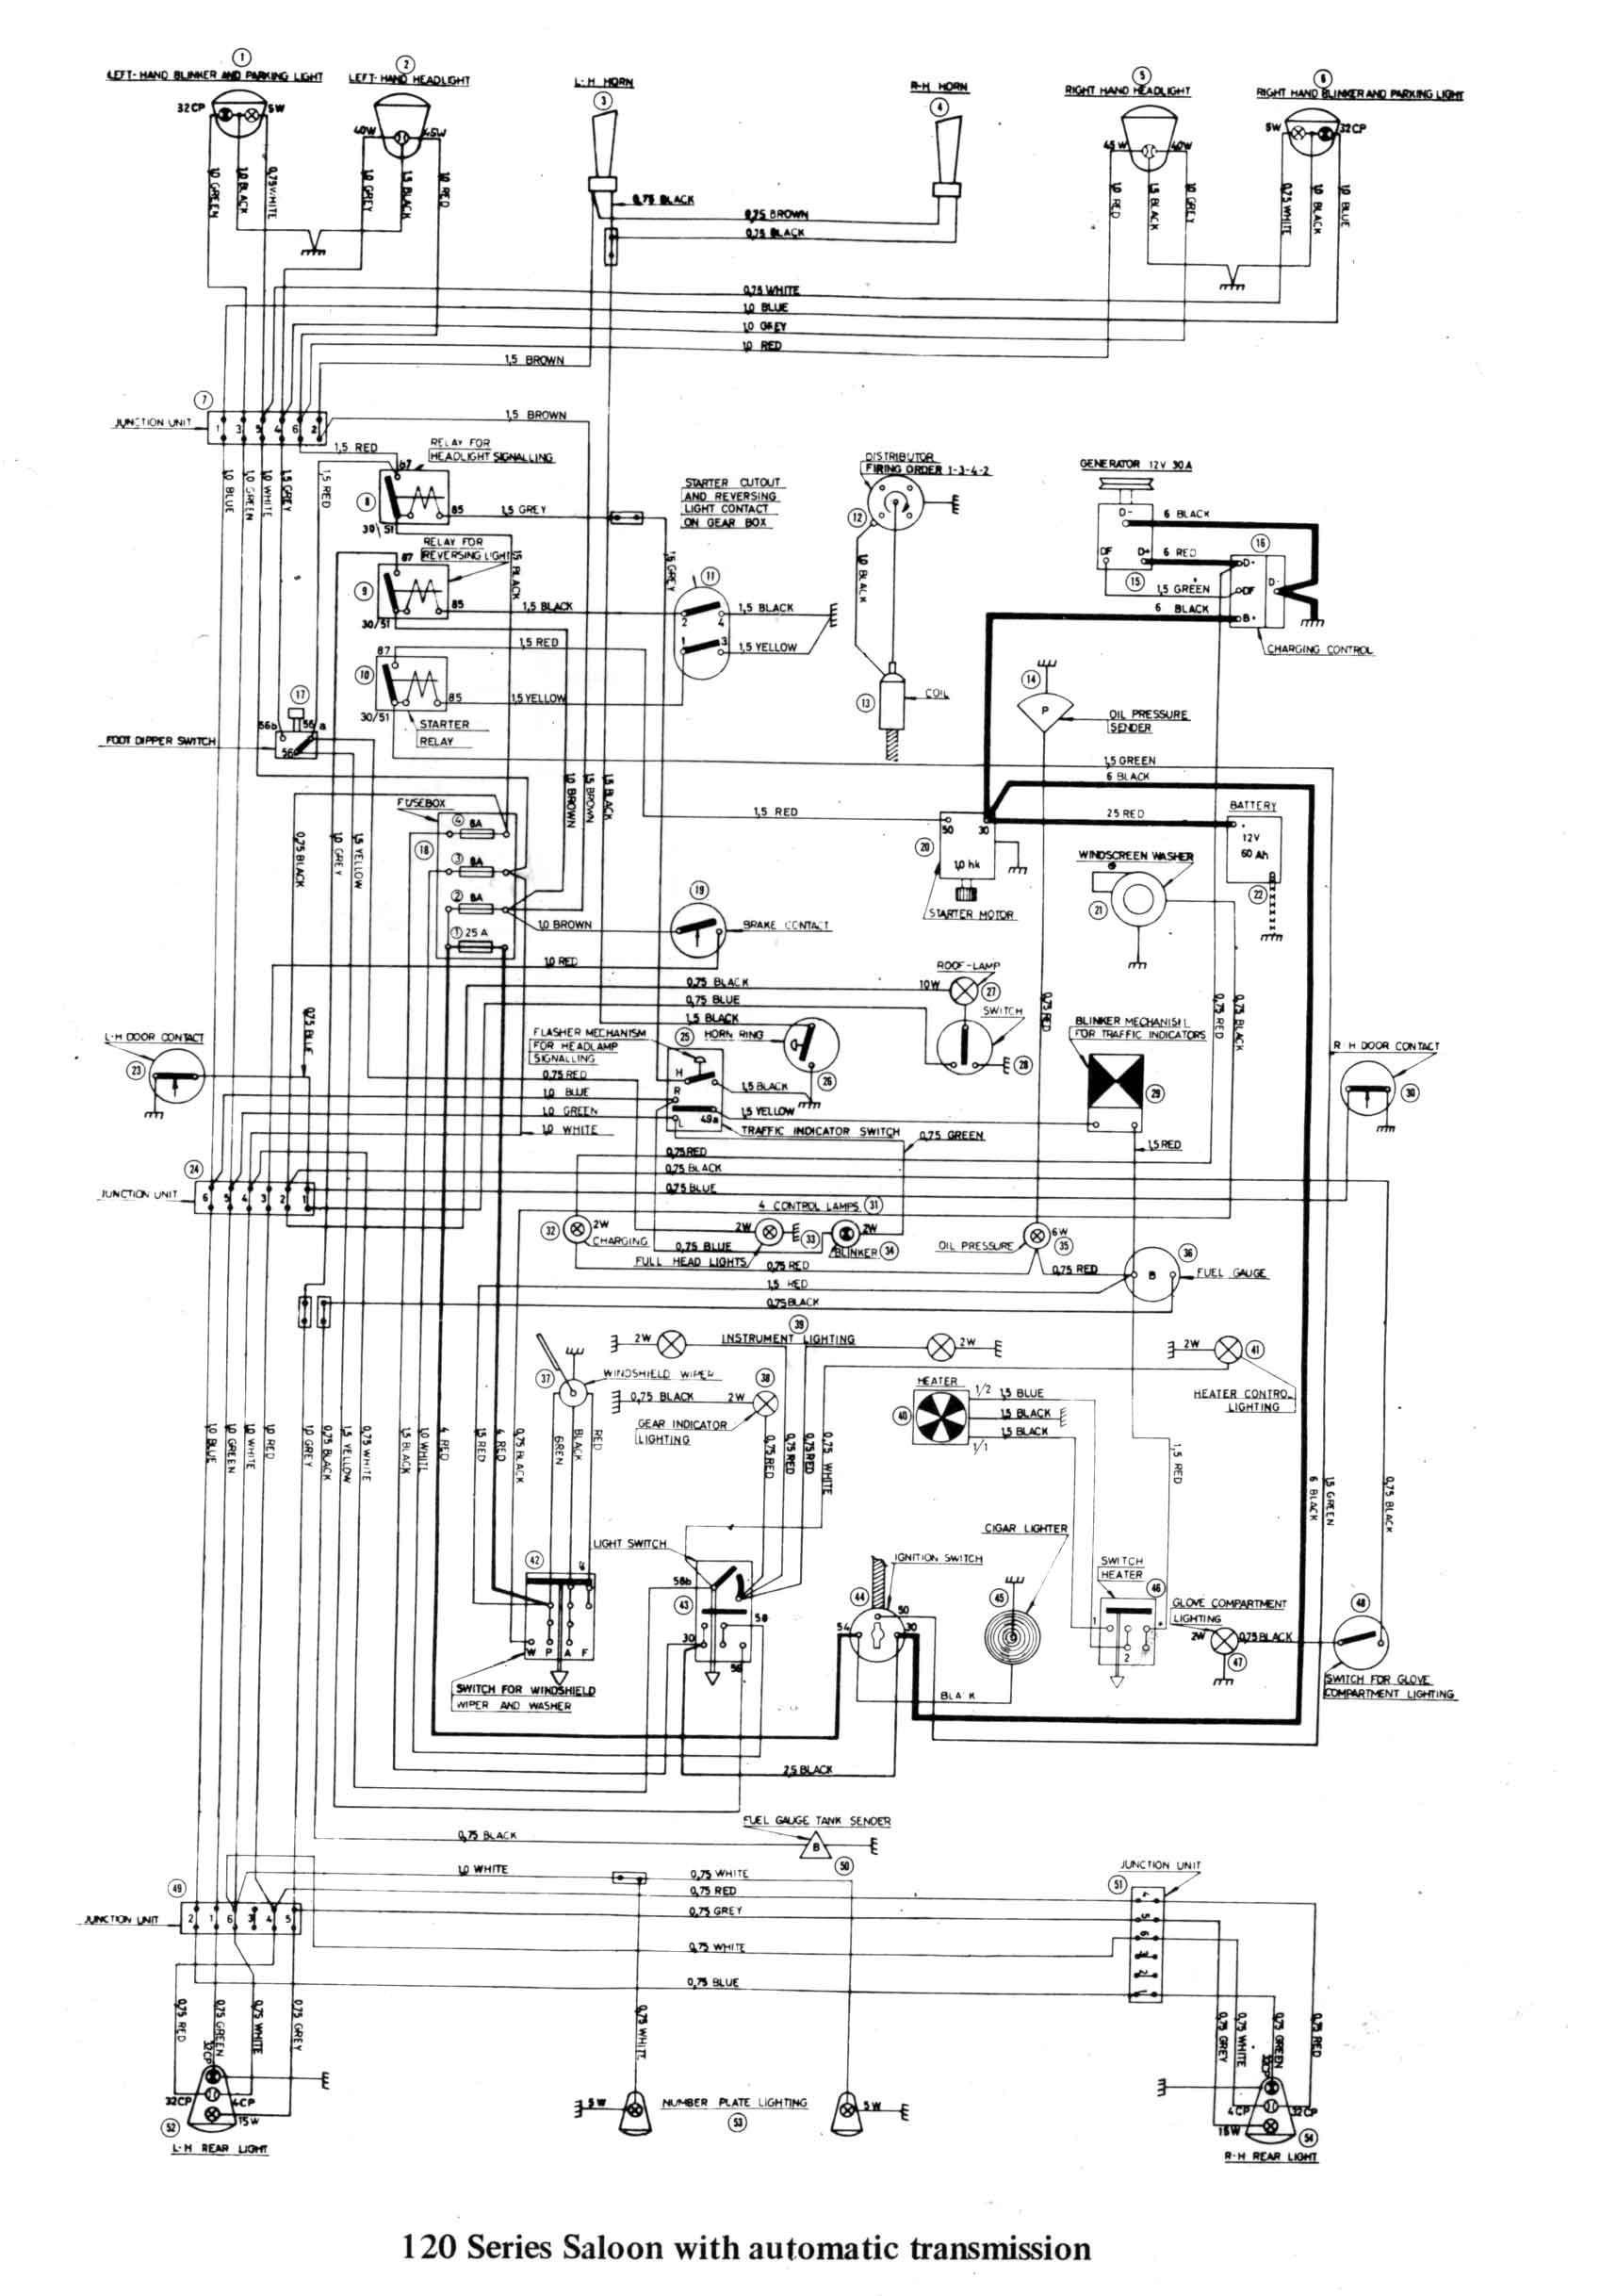 Vw 2 0 Engine Diagram 2 Vw 2 0 Engine Diagram Automatic Transmission Schematic Diagram Sw Em Of Vw 2 0 Engine Diagram 2